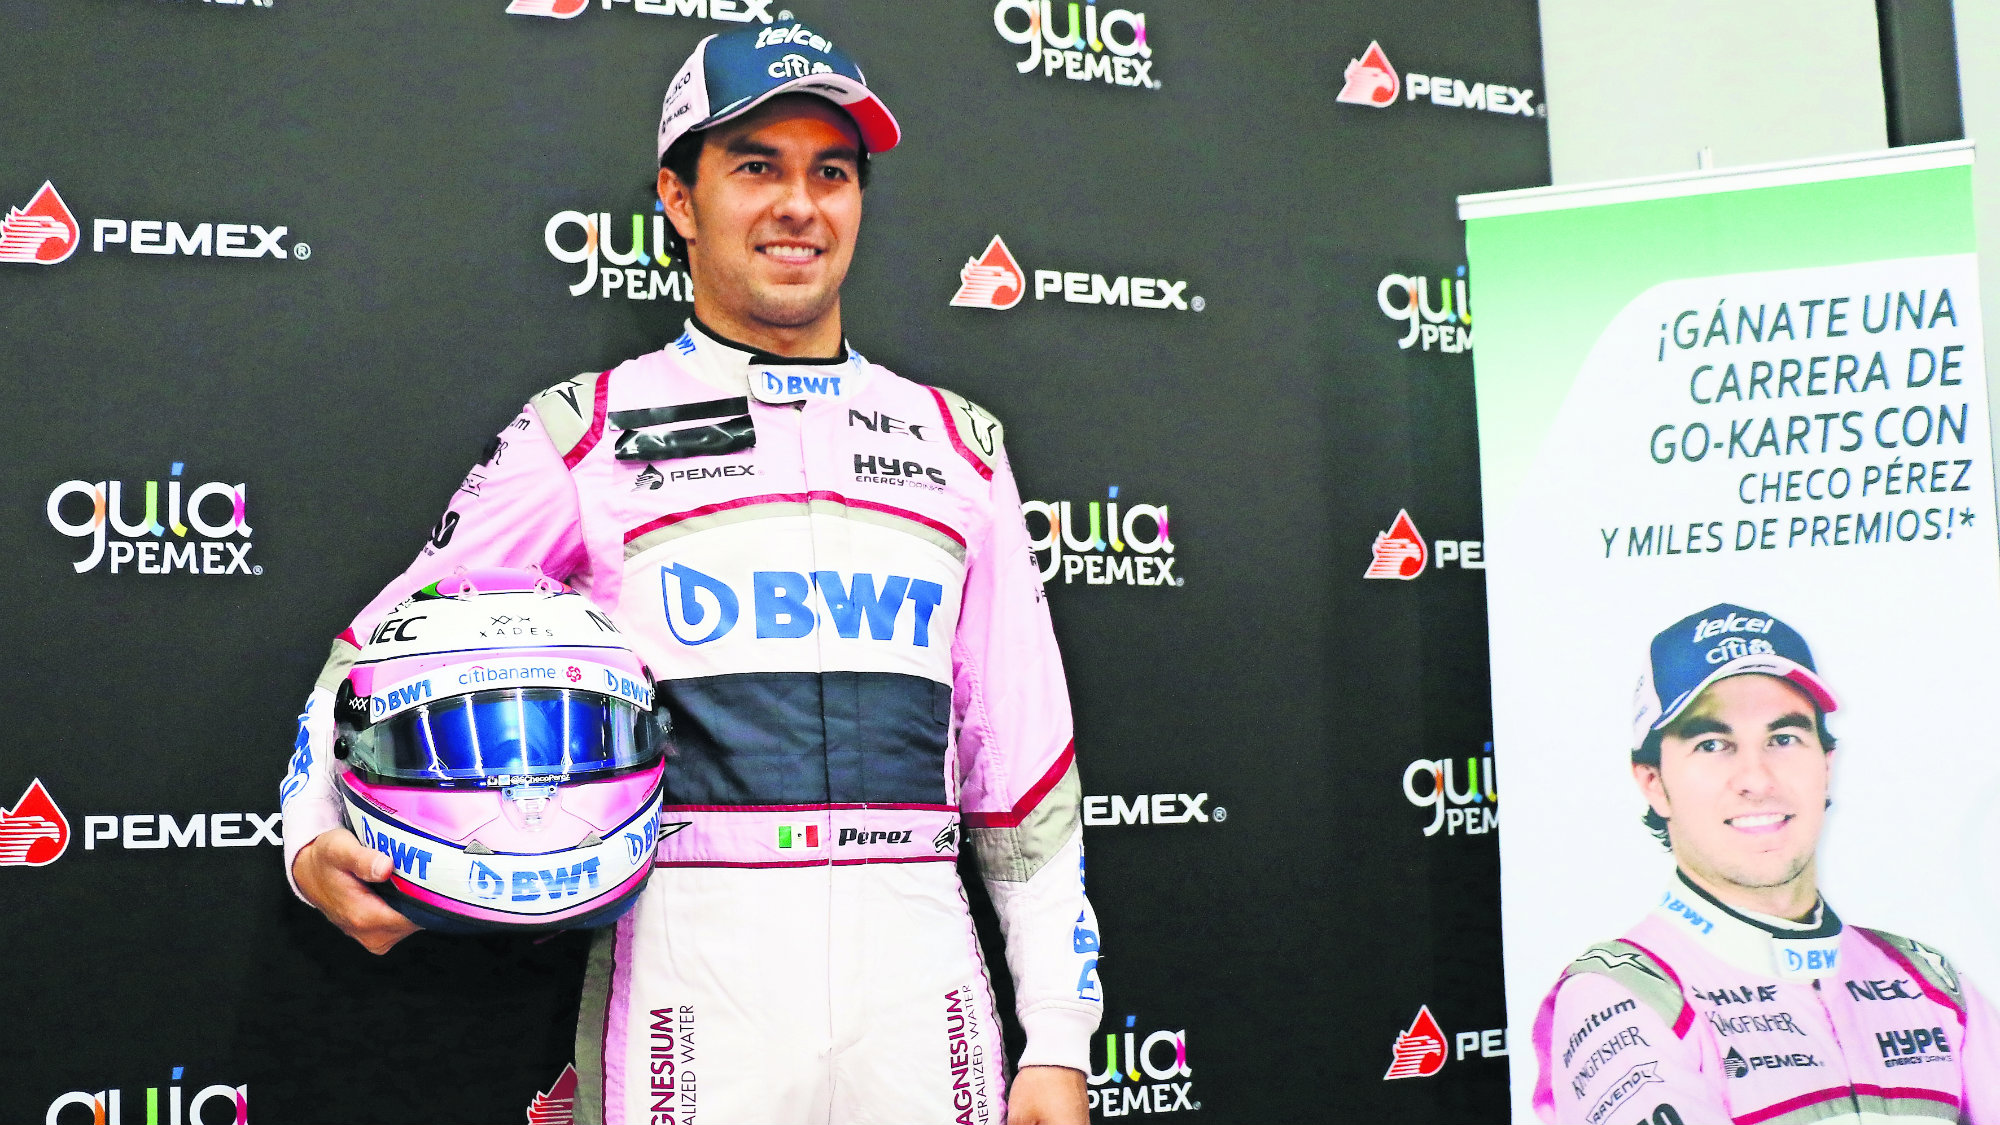 Checo Perez Fórmula 1 México